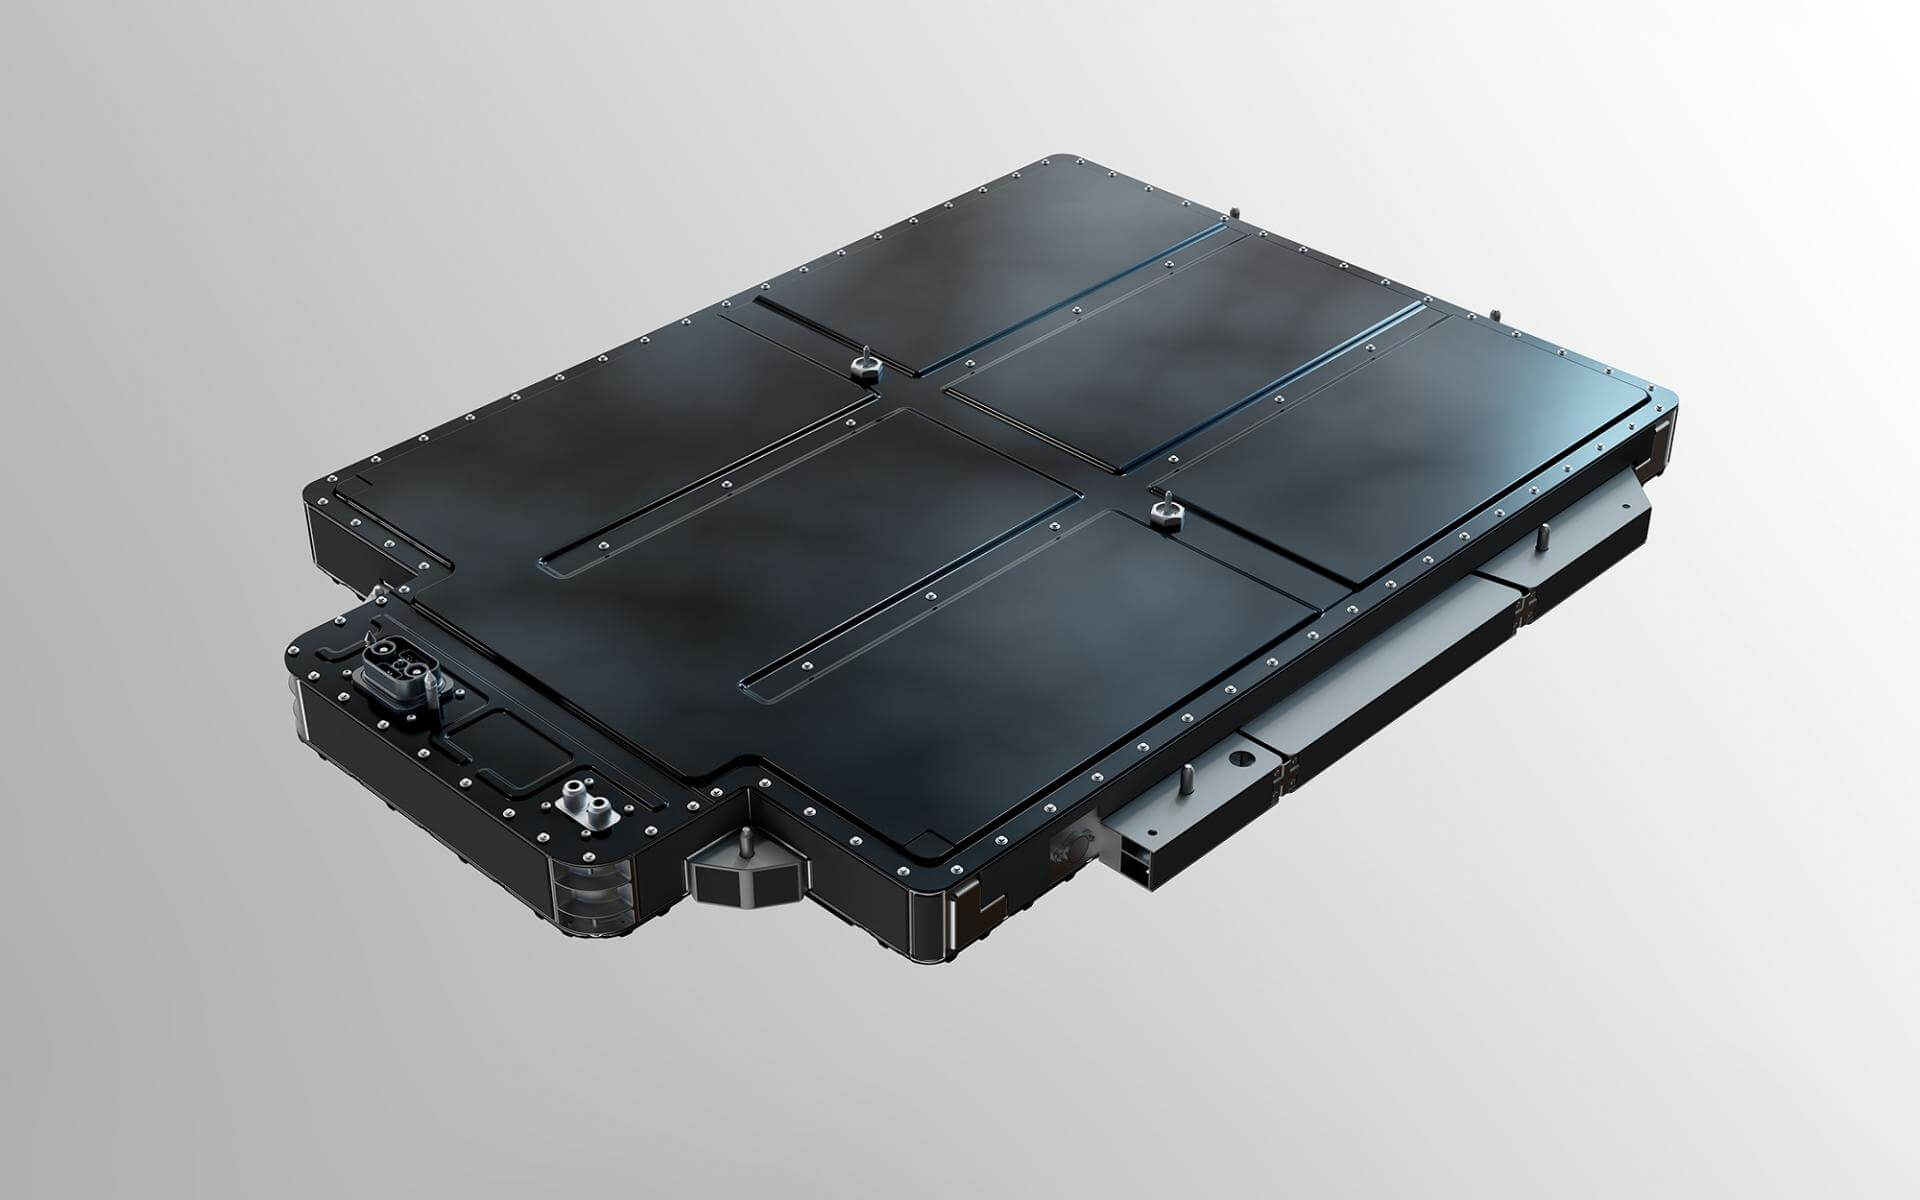 NIO представляет гибридную батарею стандартного диапазона на 75 кВт⋅ч